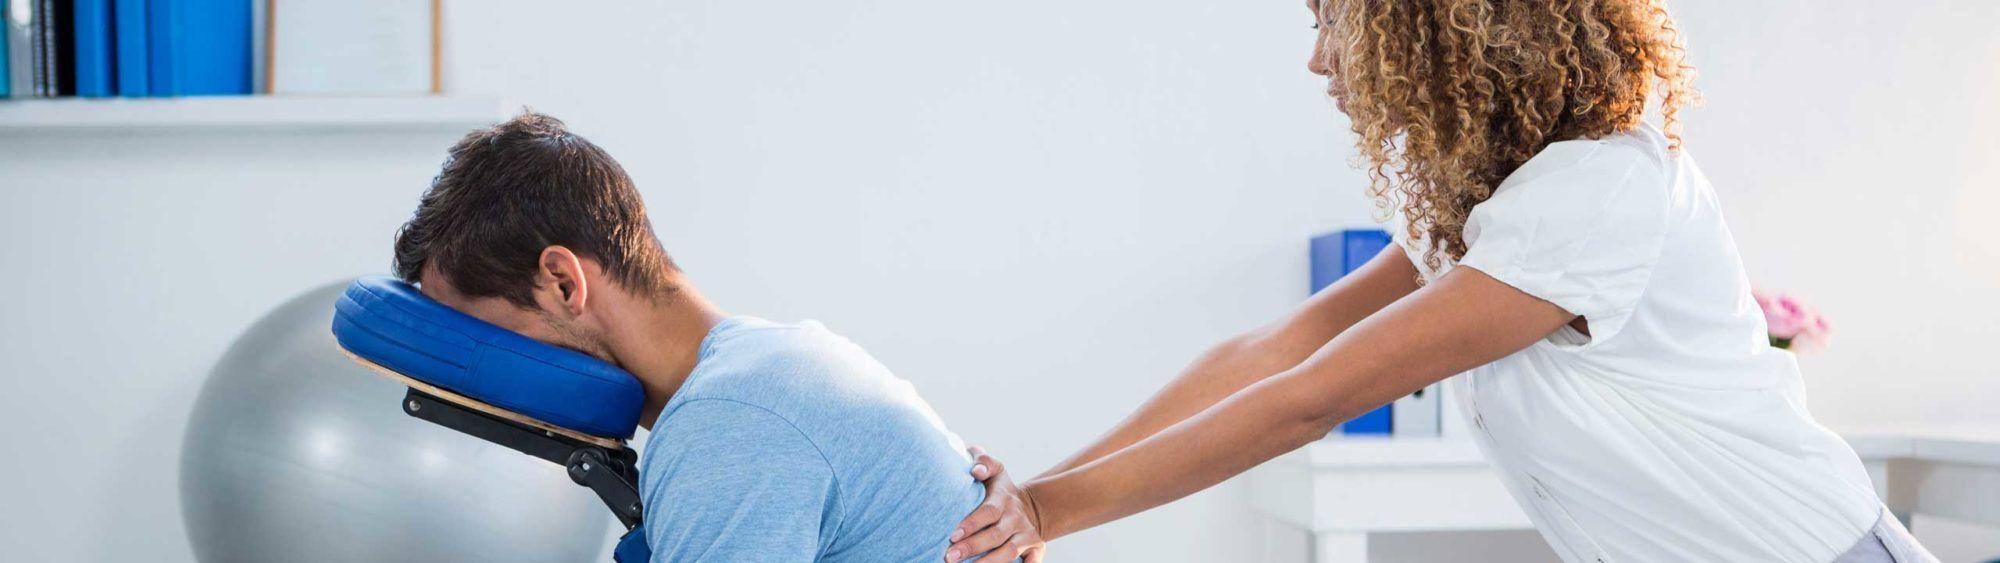 emkiro-registered-massage-therapy-toronto-downtown